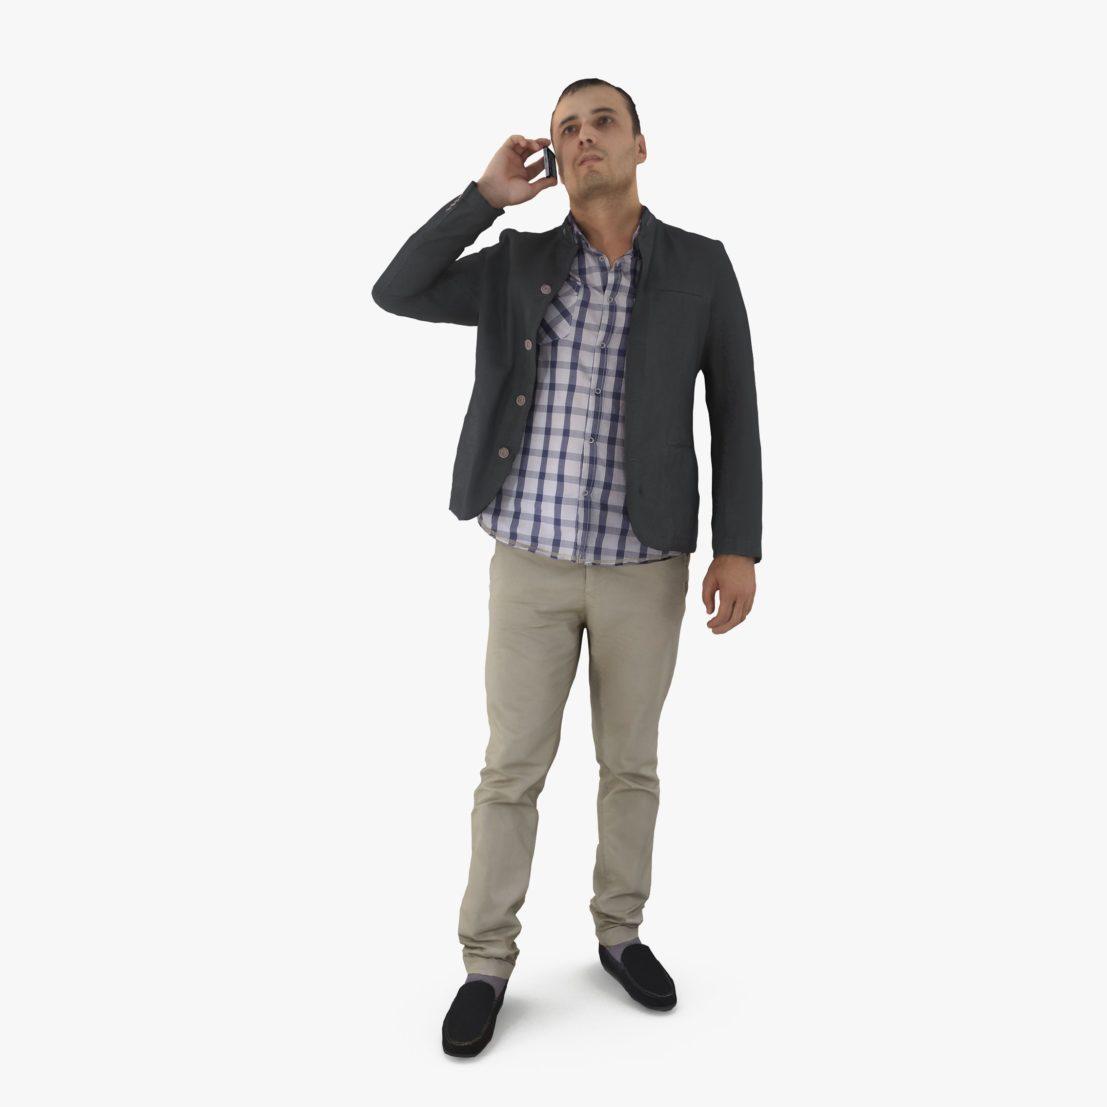 Urban Man Calling 3D Model   3DTree Scanning Studio